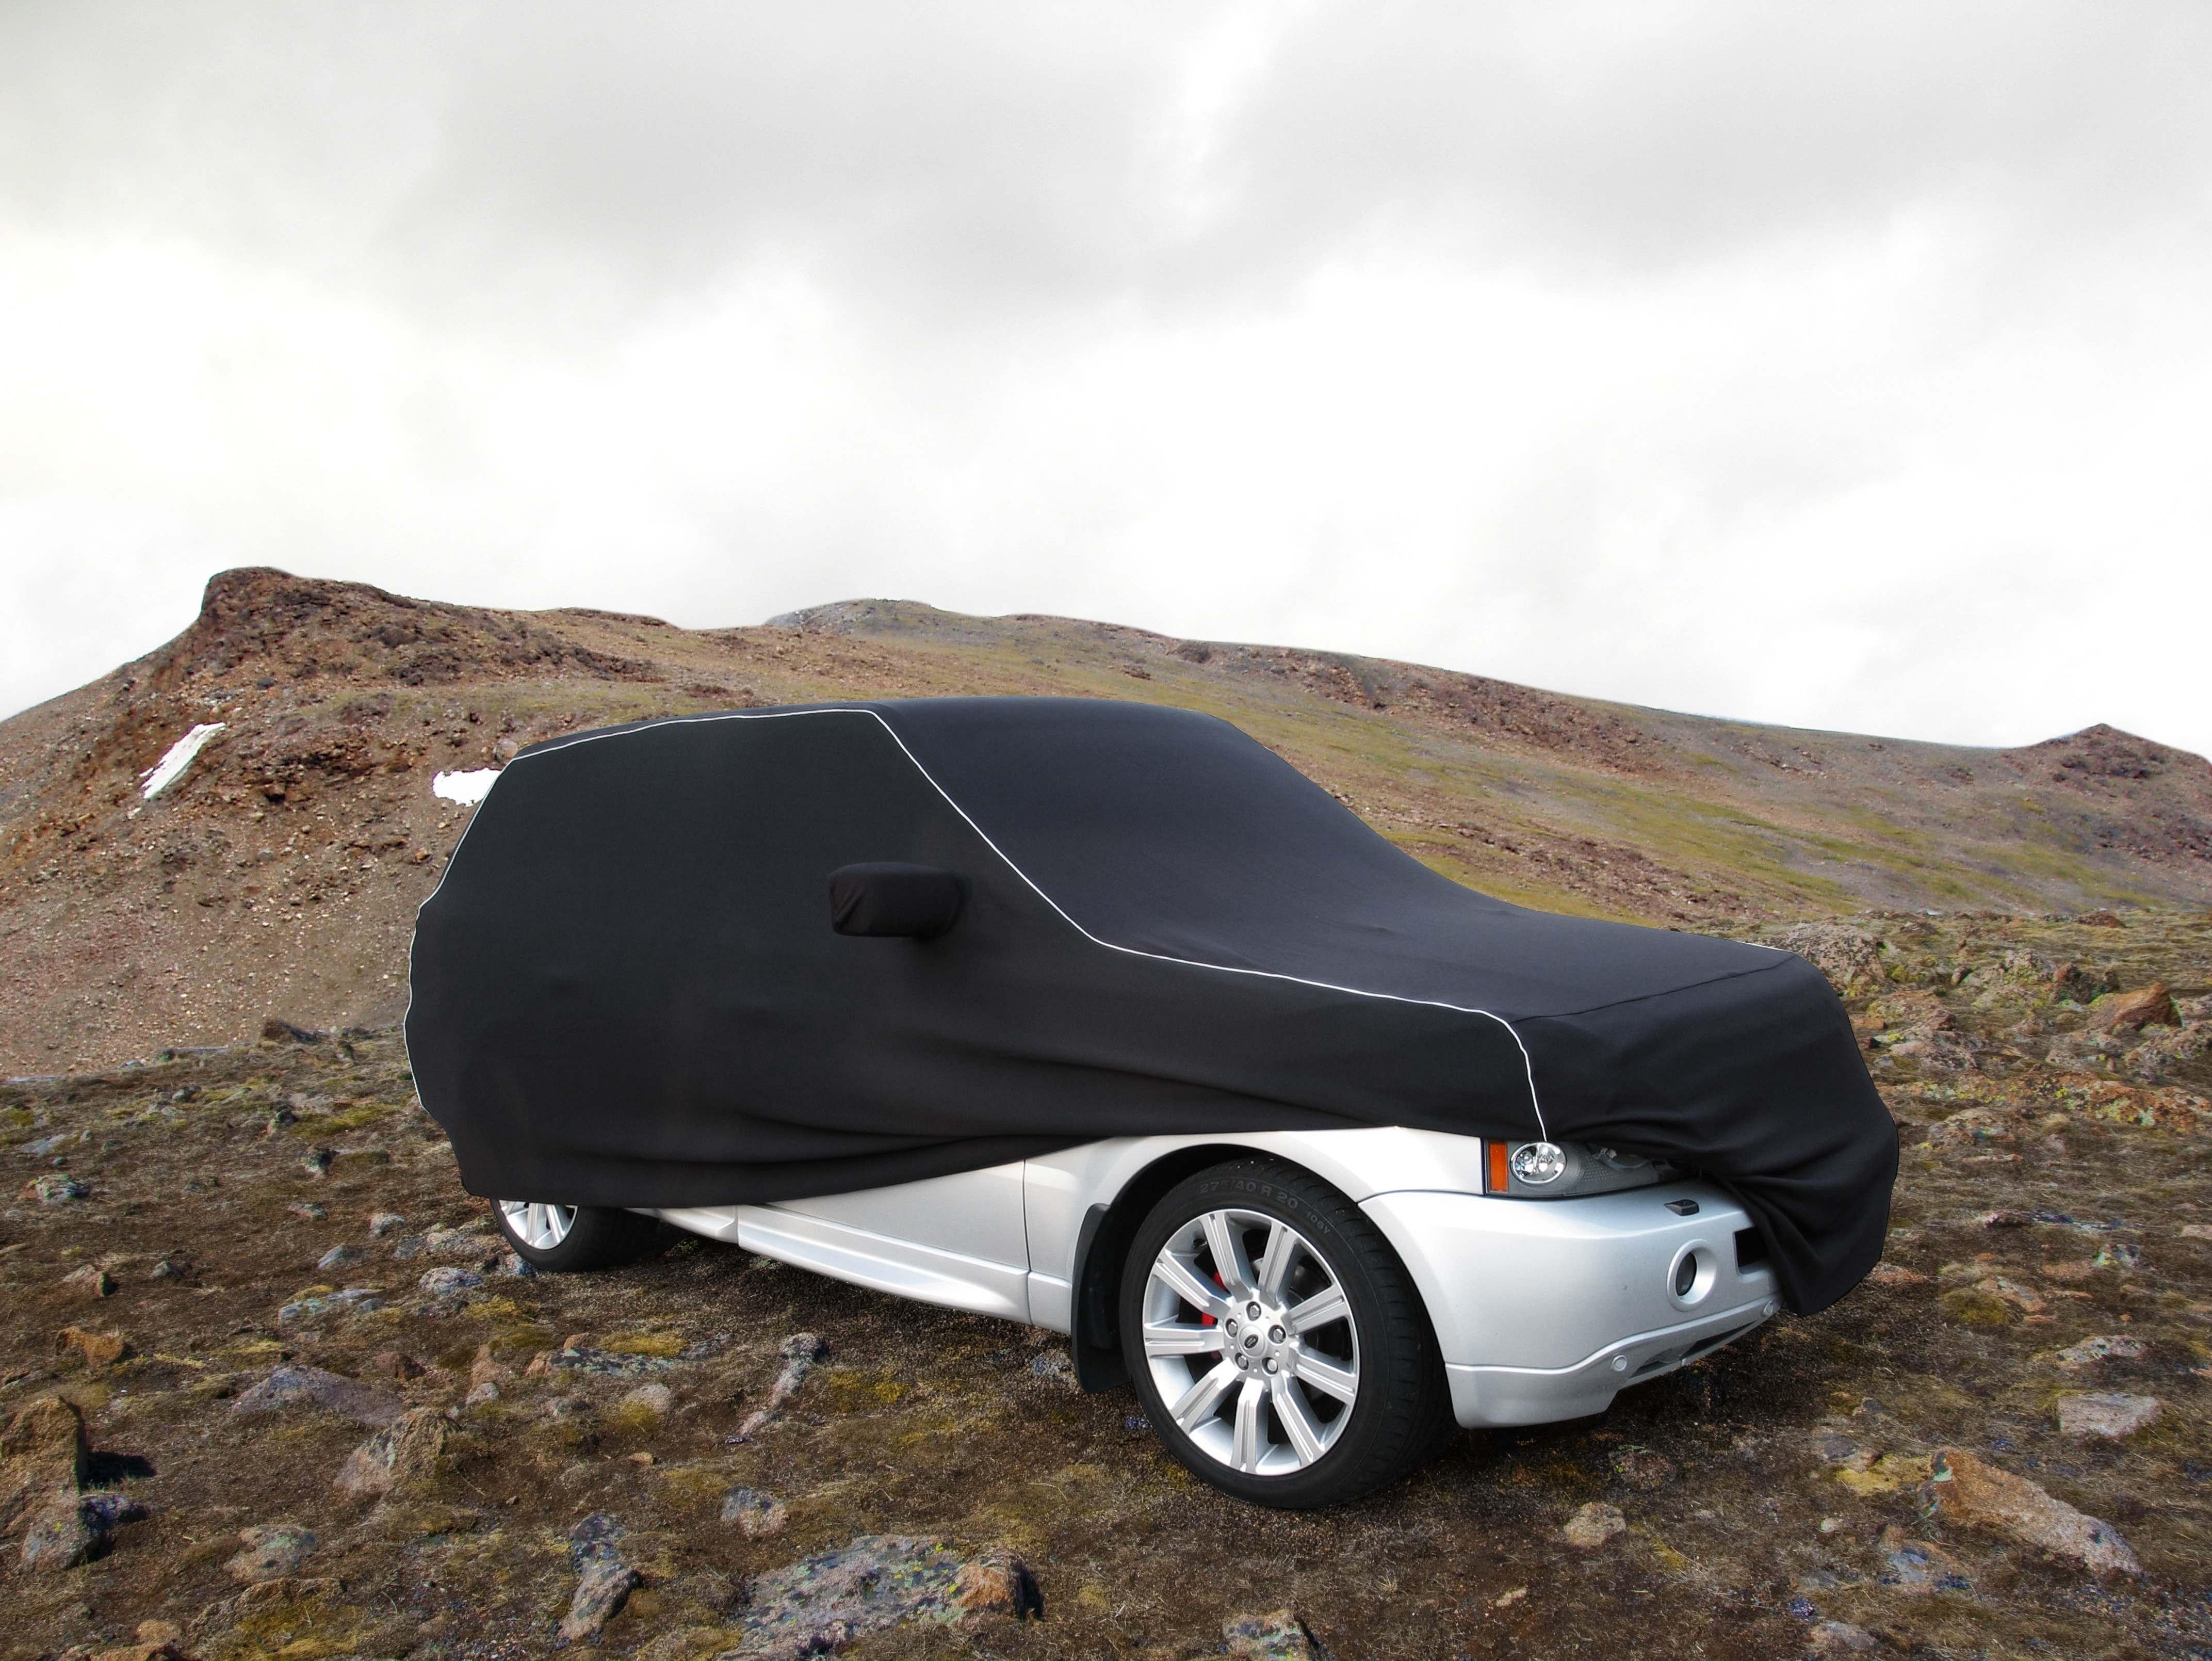 Prestige indoor car cover